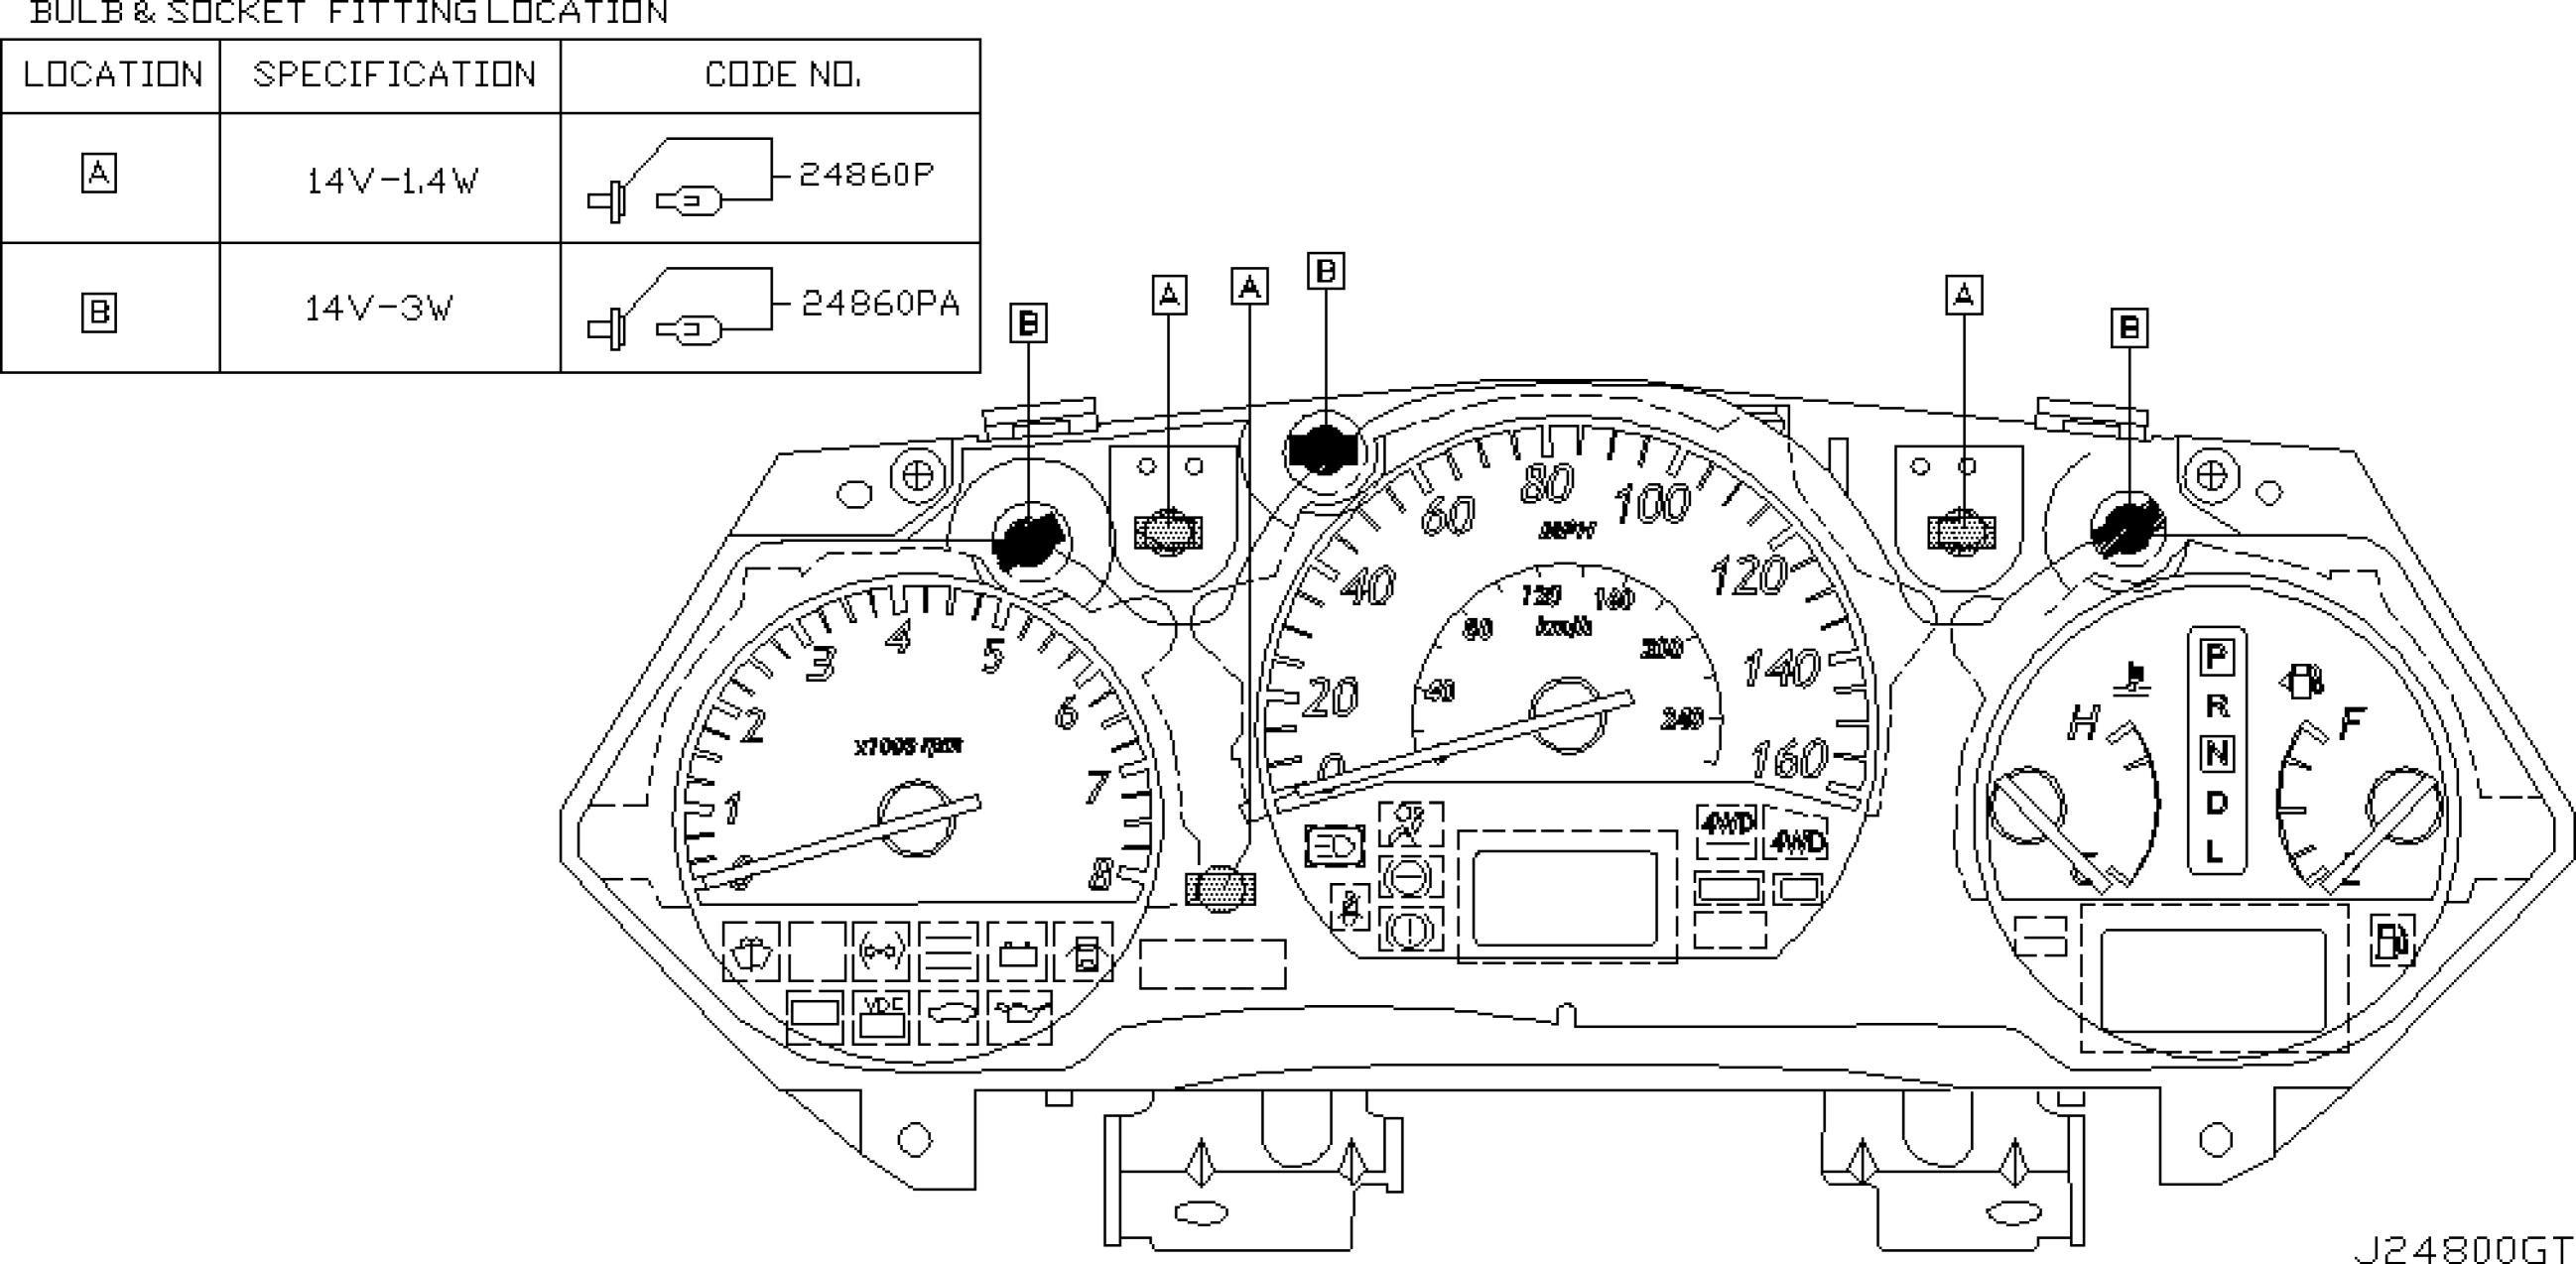 2005 nissan murano parts diagram